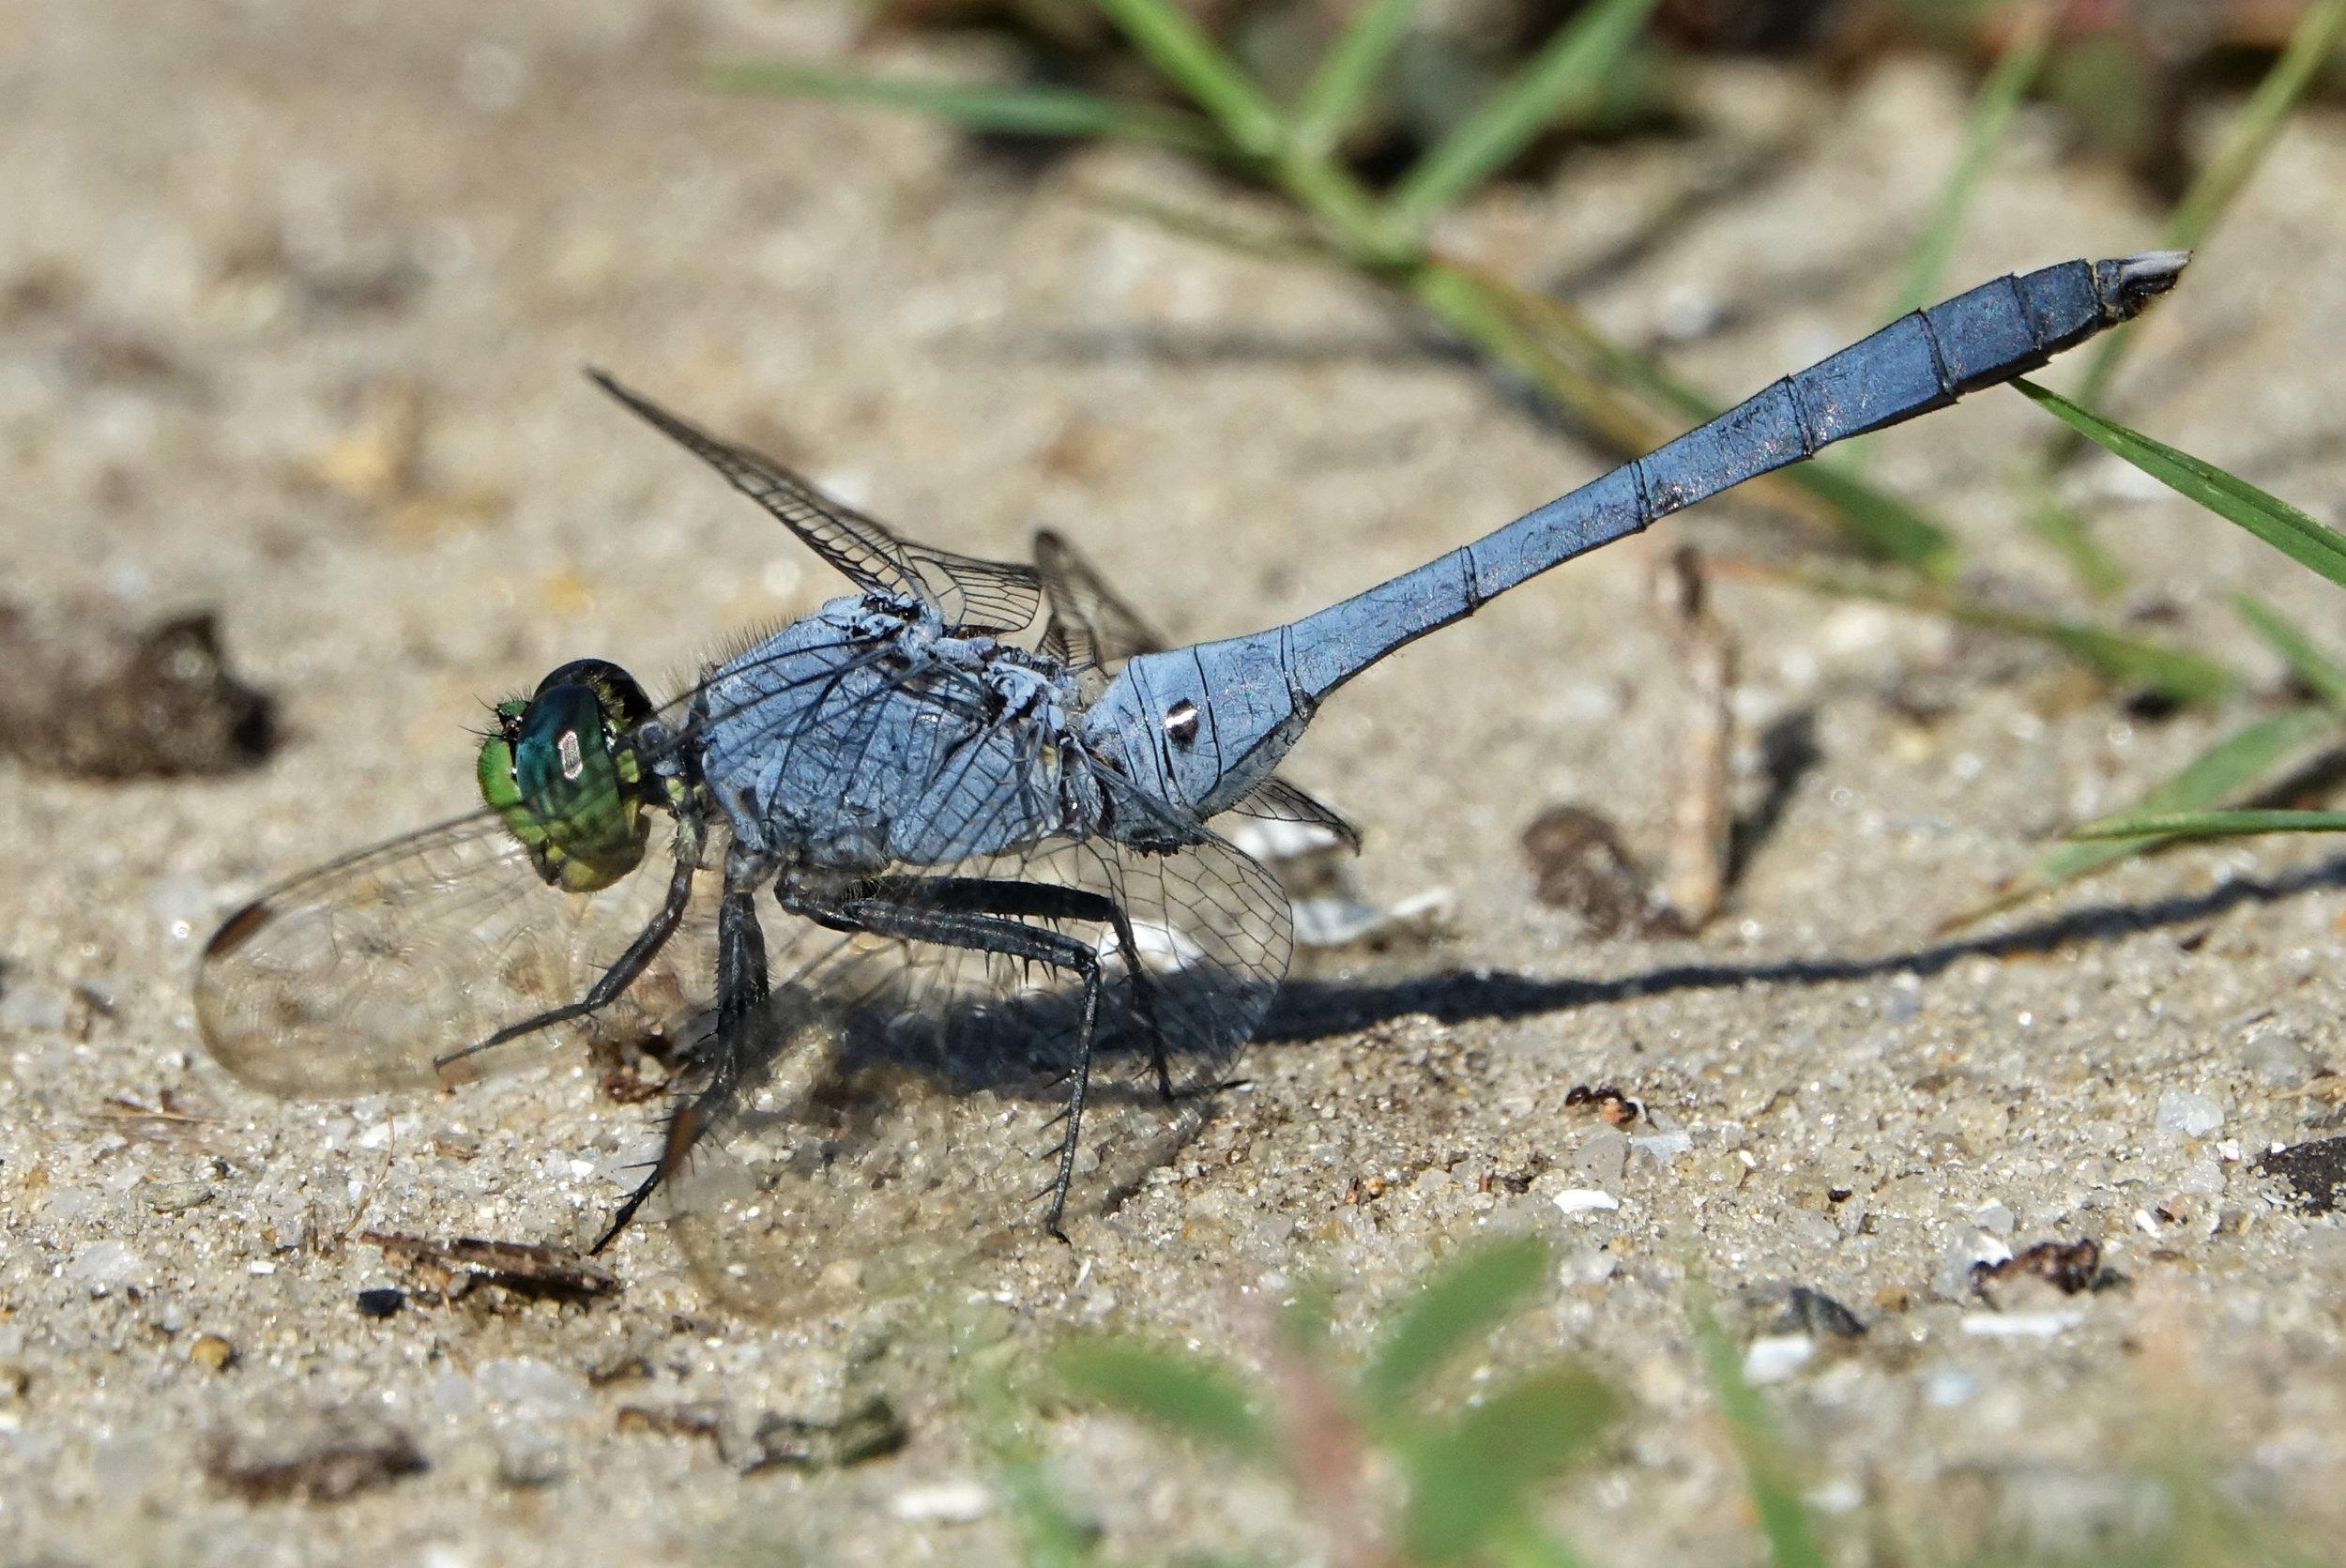 EASTERN PONDHAWK ( Erythemis simplicicollis),  South Carolina, August 2017